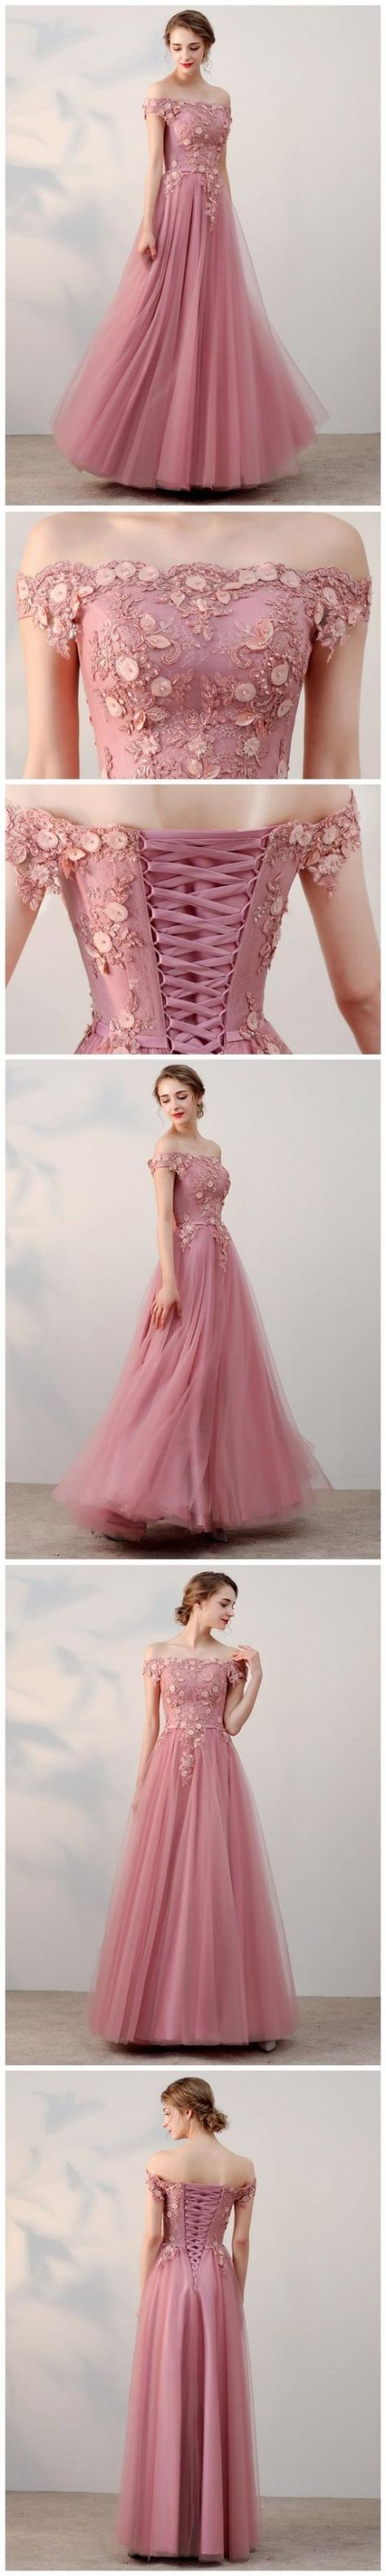 Long Prom Dress, Handmade Prom Dress,Prom Dresses,,Evening Dress, Ball Gown Prom dress, Formal Women Dress,prom dress